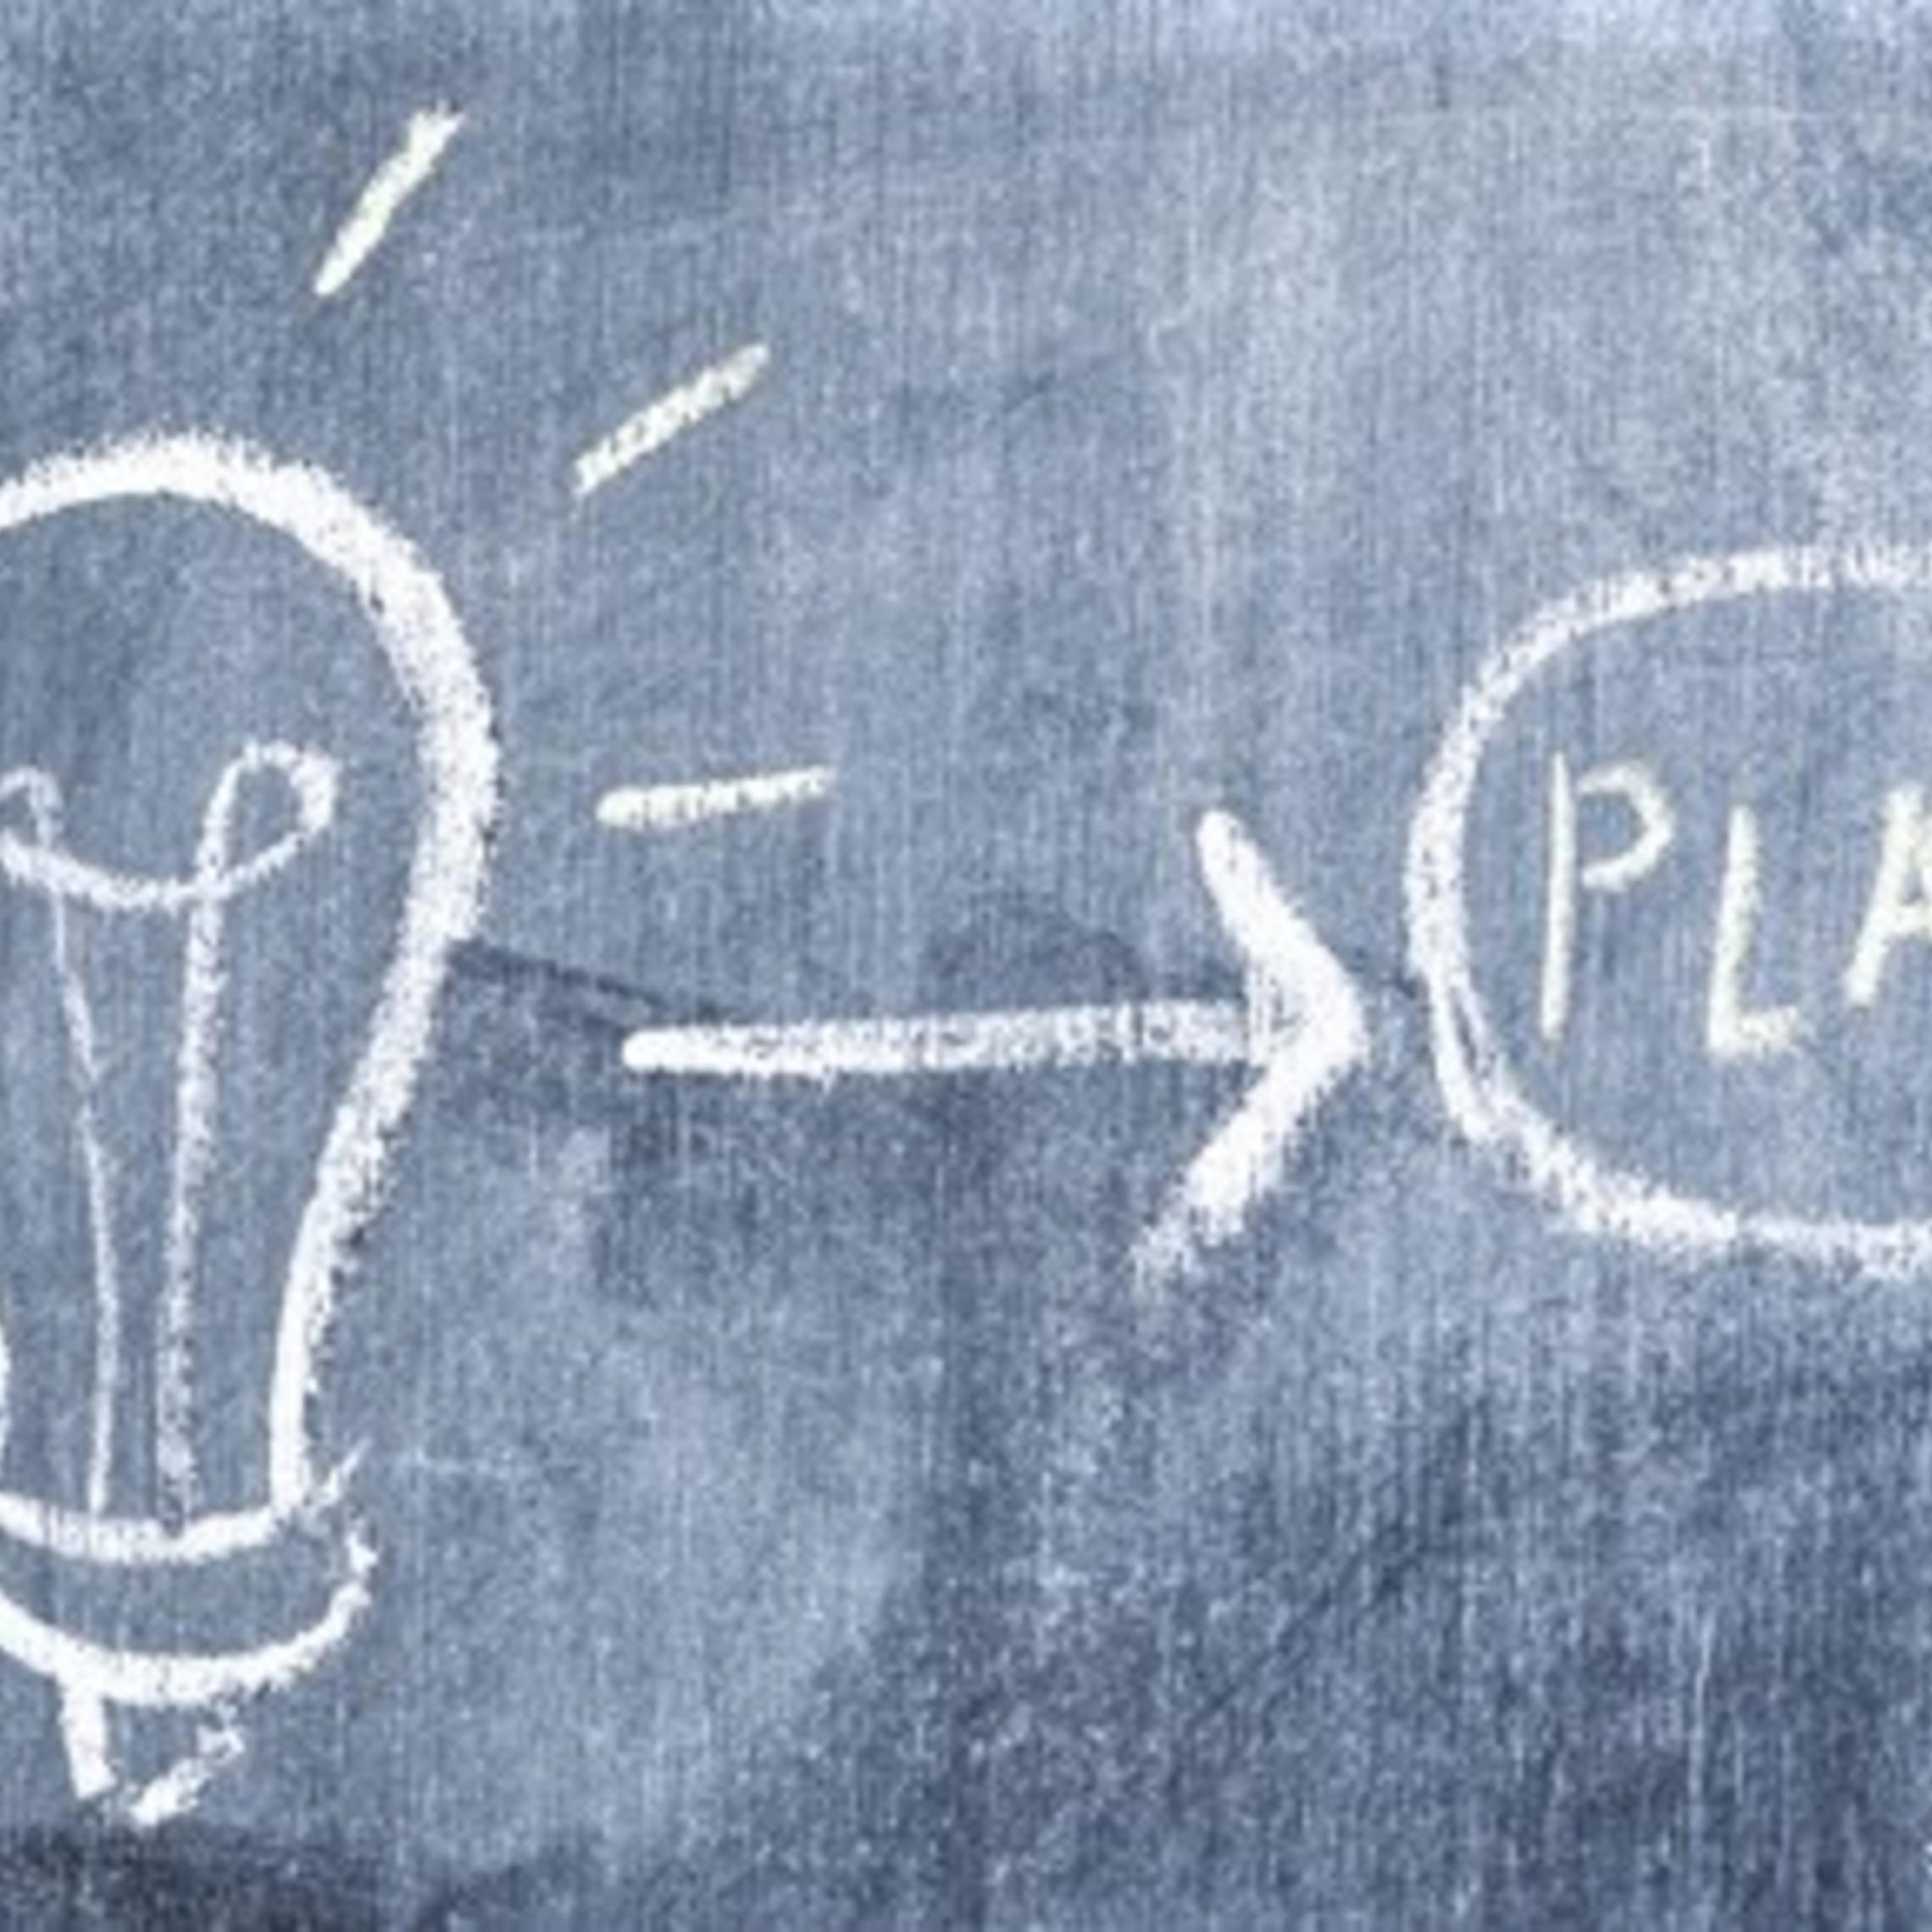 Light Bulb Arrow Pointing Toward Plan Drawn Chalkboard 23 2147873885